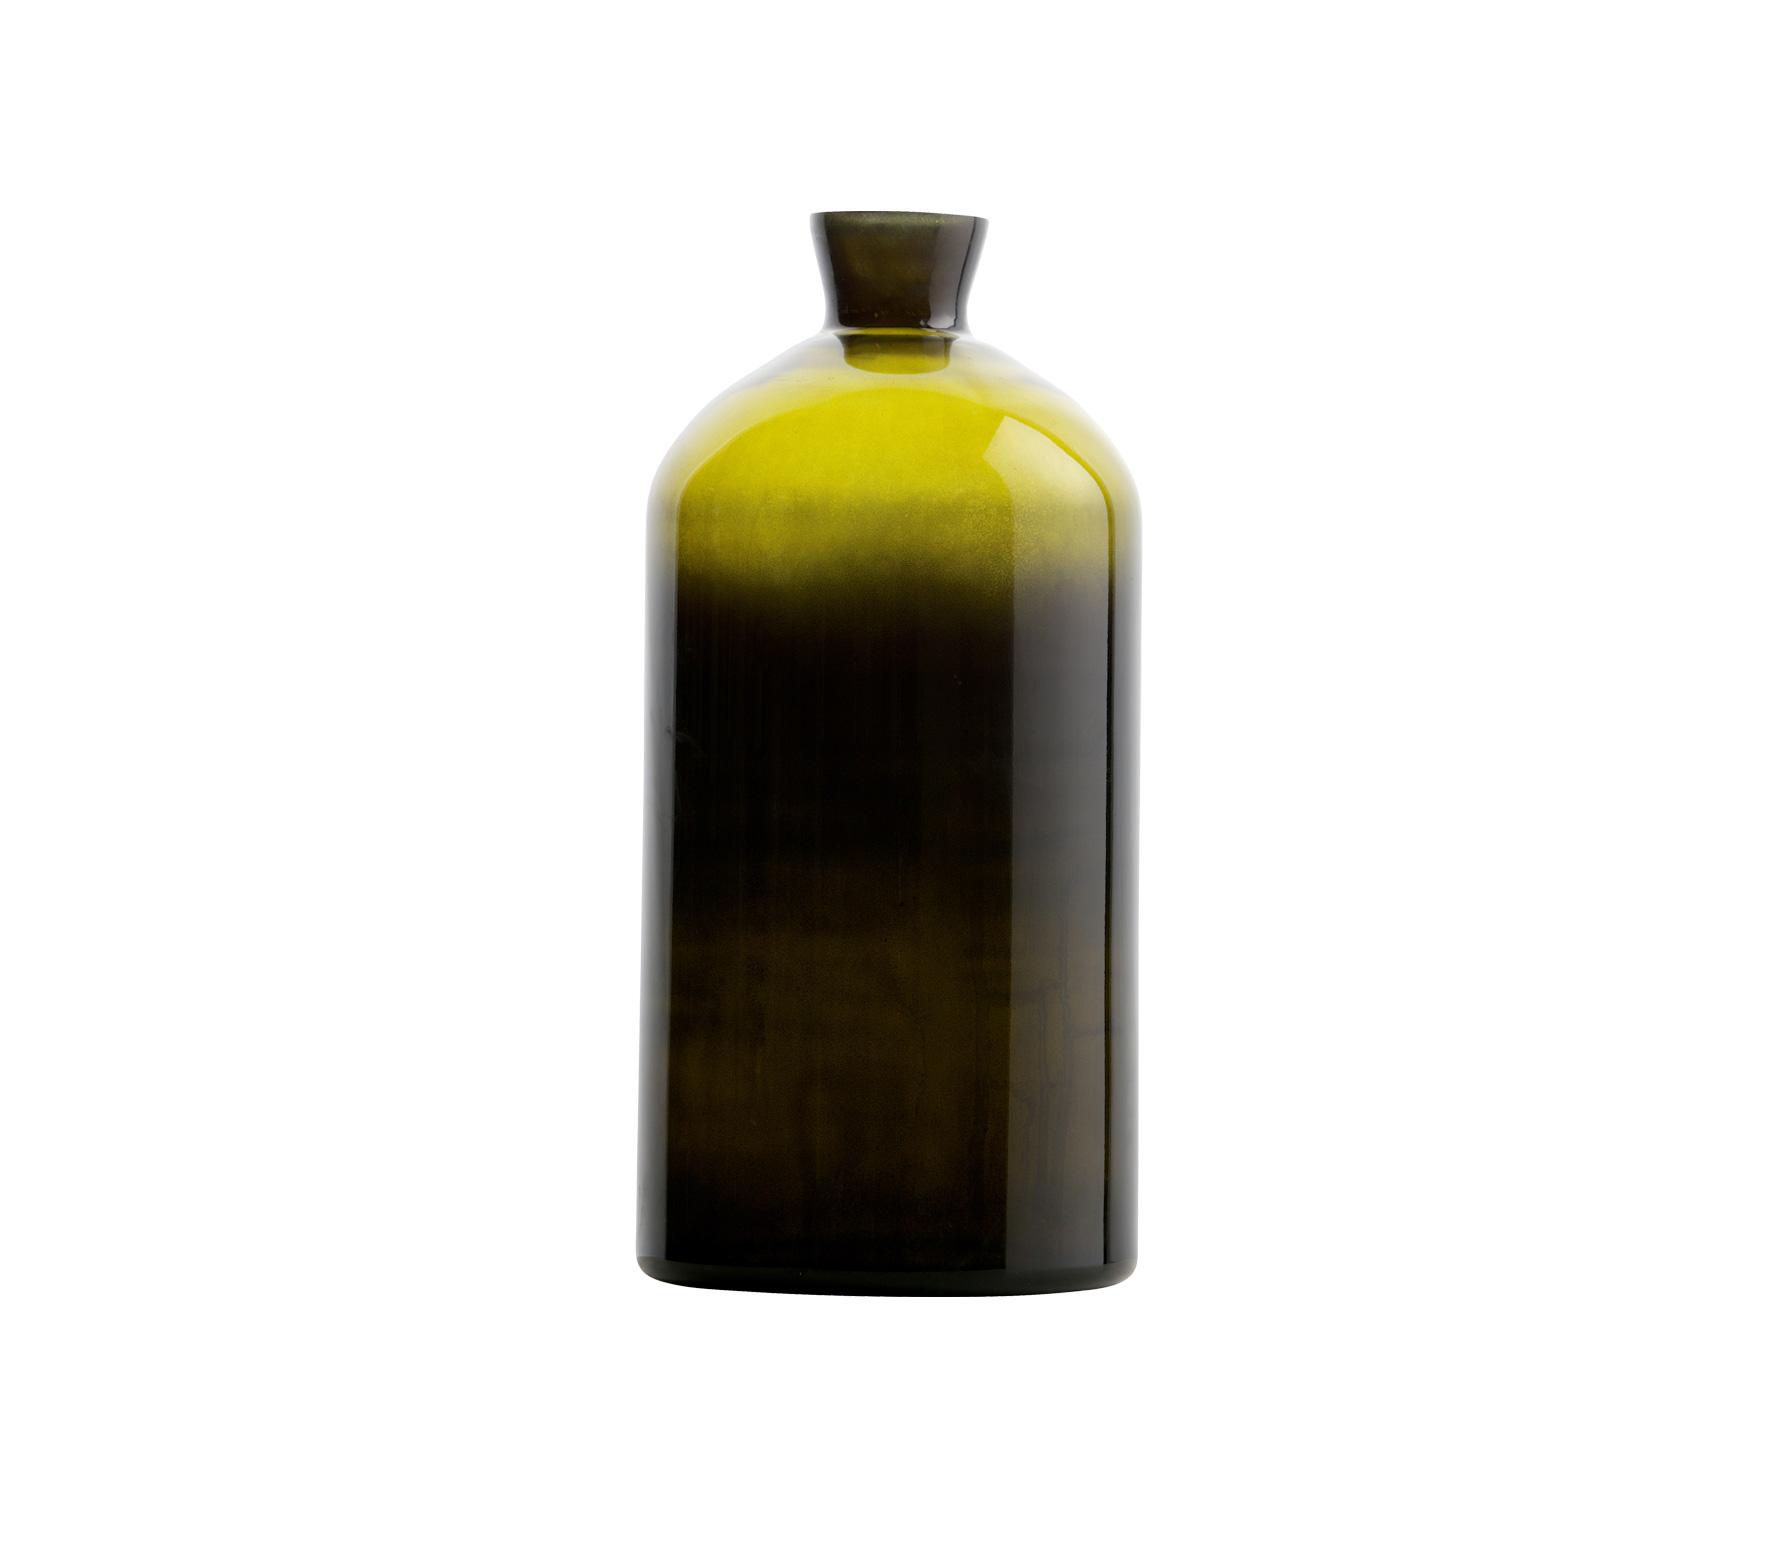 BePureHome Chemistry glazen vaas XL olive Olive